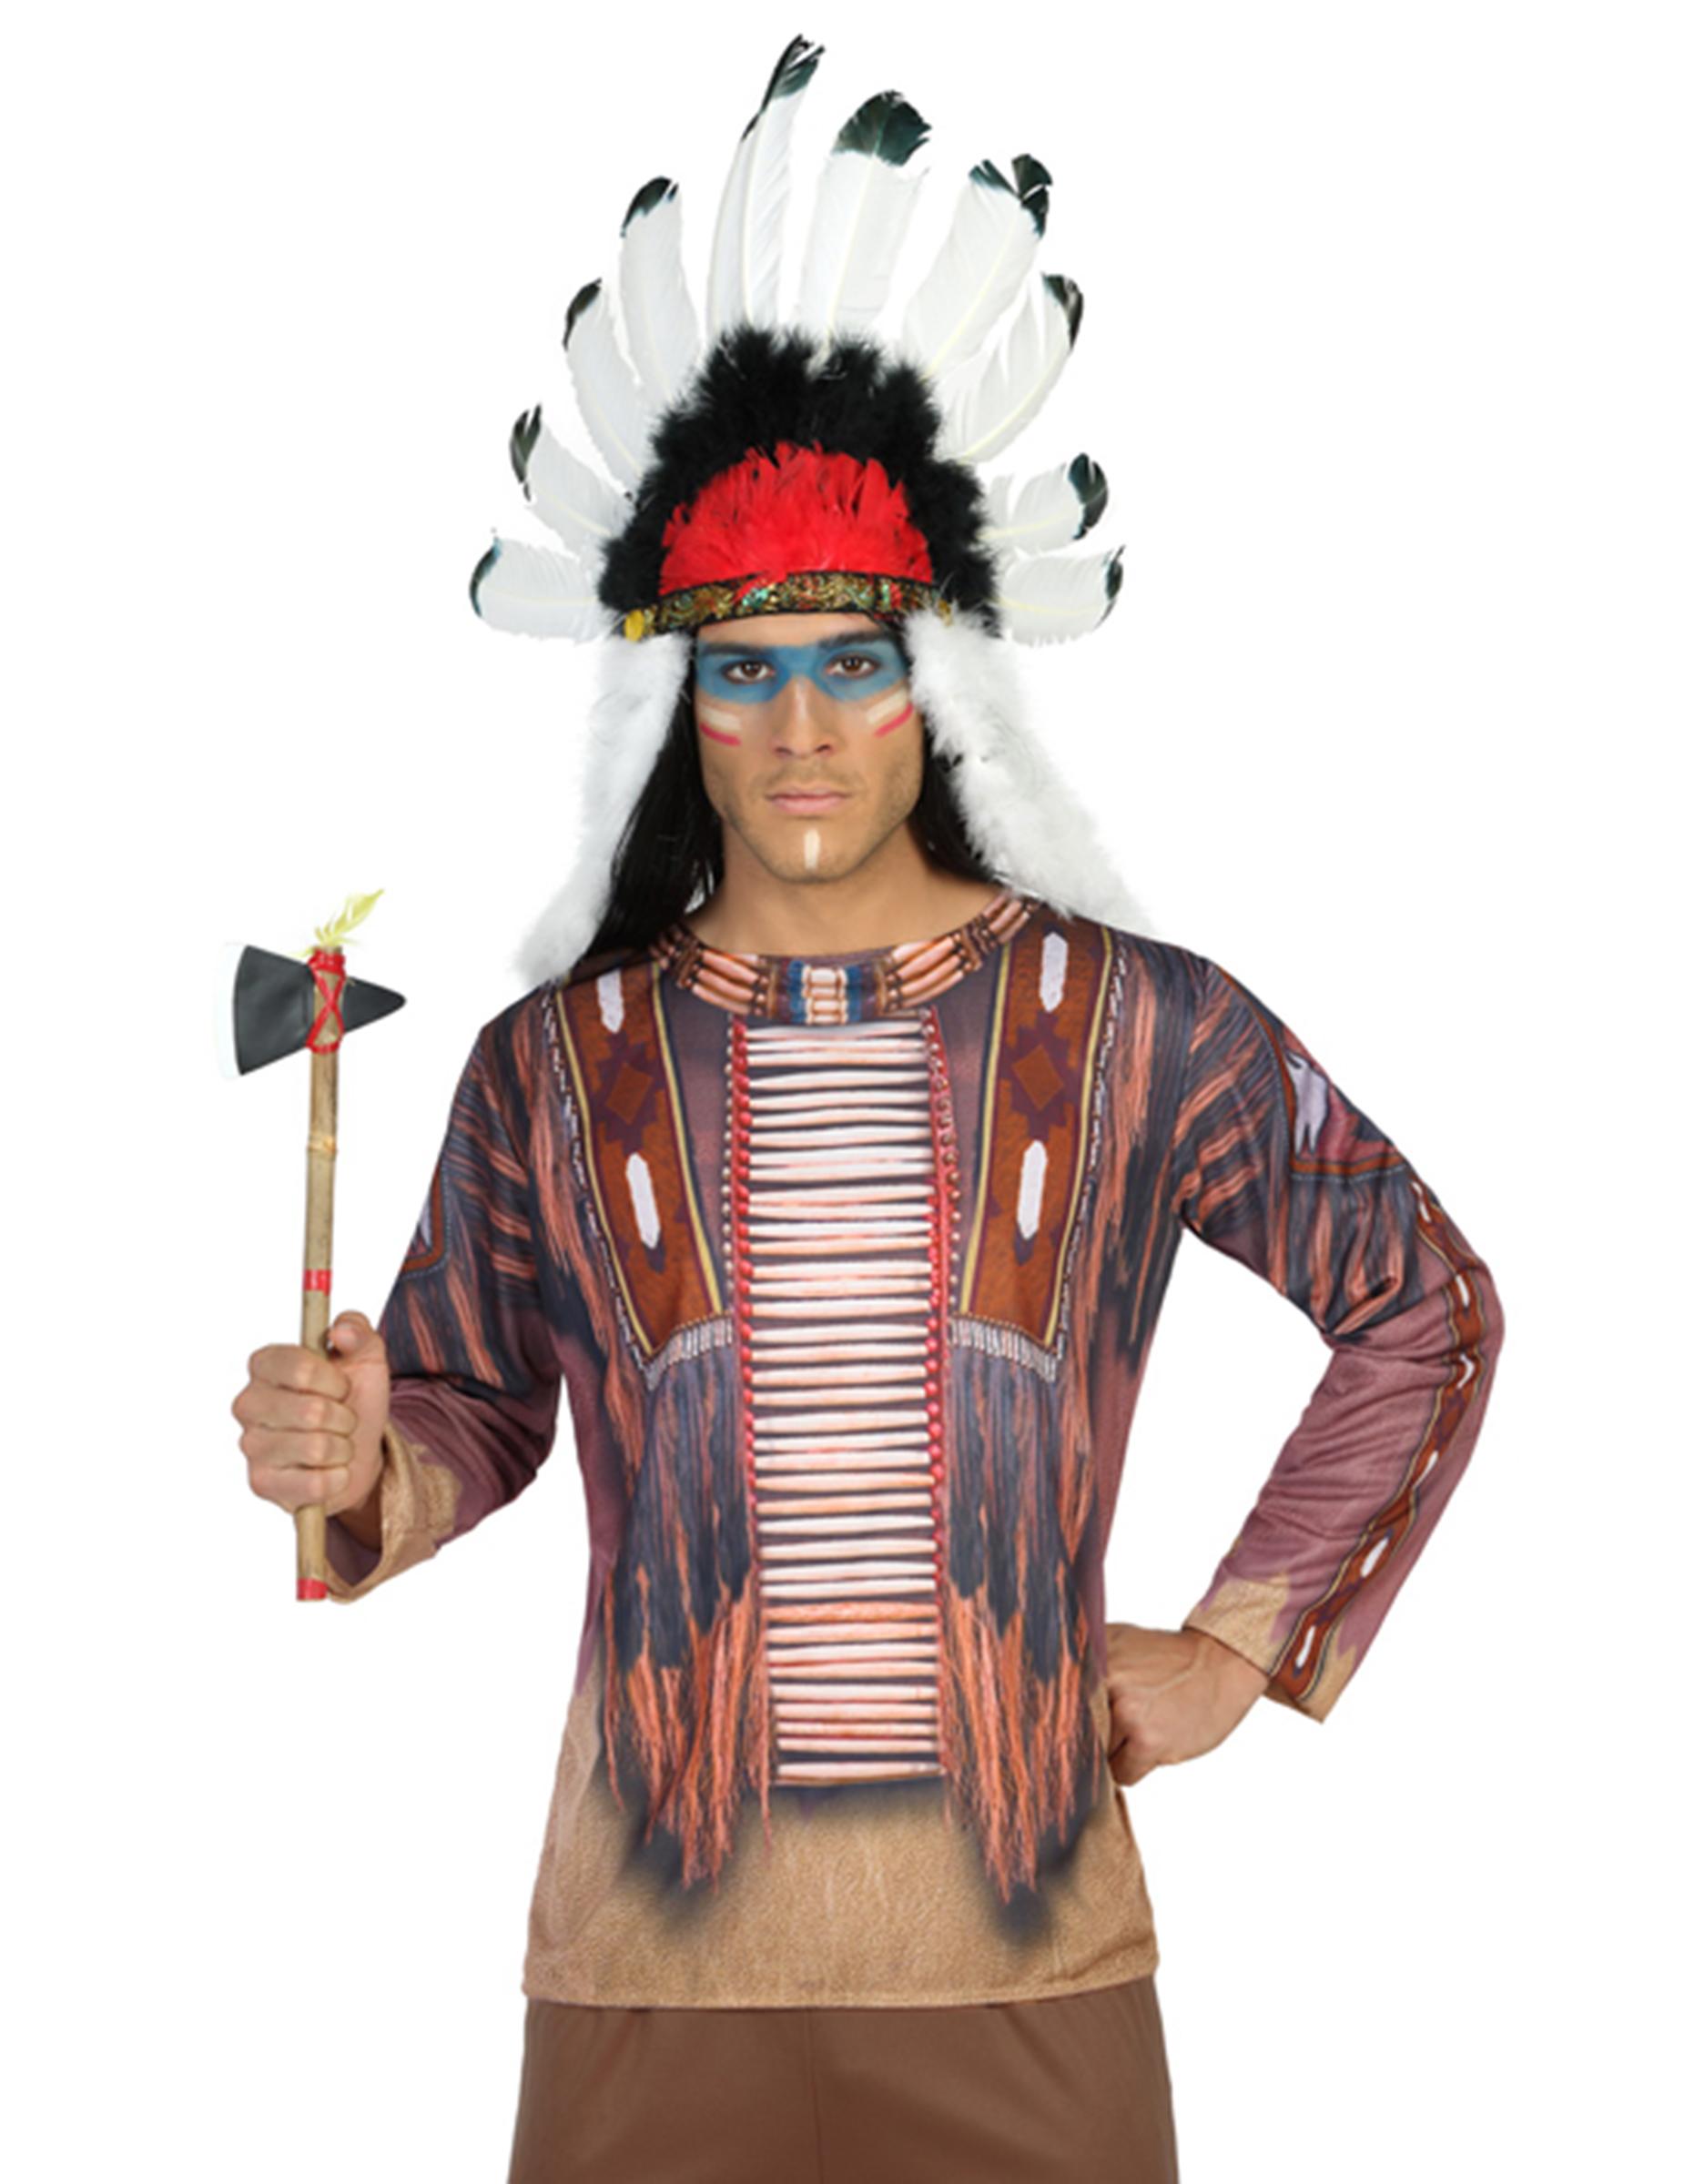 indianer t shirt f r herren kost me f r erwachsene und g nstige faschingskost me vegaoo. Black Bedroom Furniture Sets. Home Design Ideas